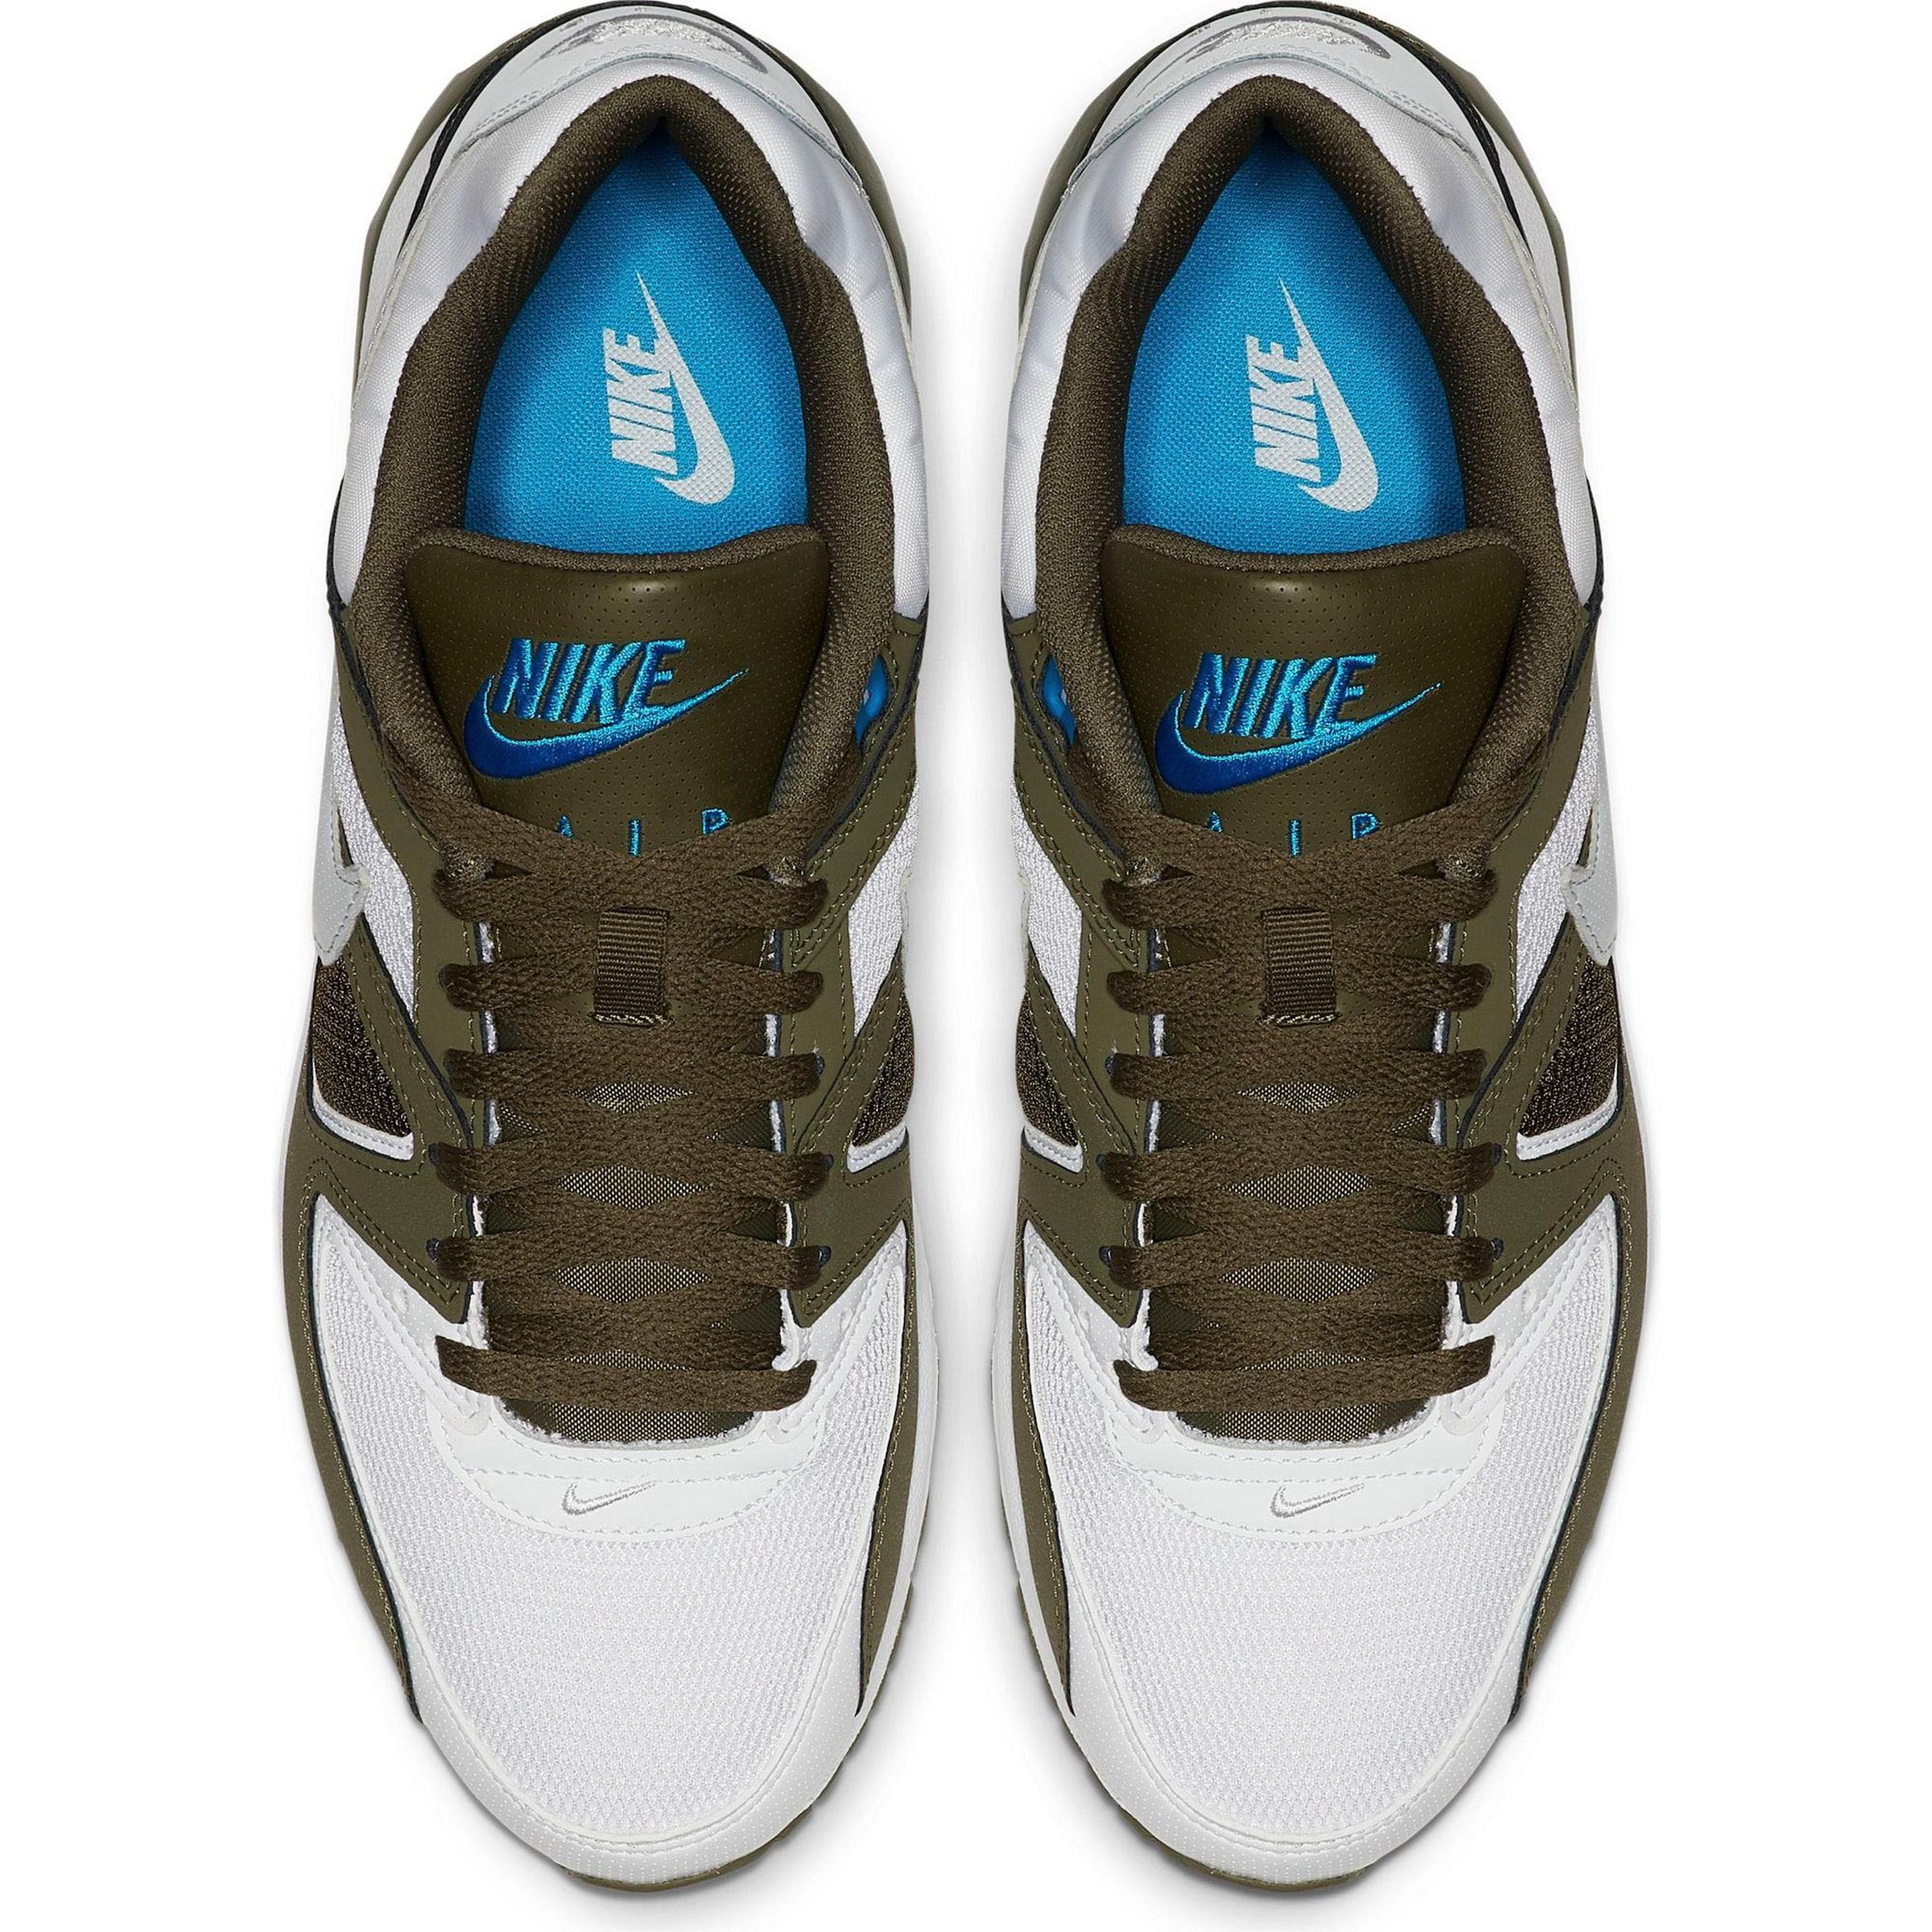 Max BraunWeiß 'air Command' Sneaker In Nike Sportswear SMGUqzpV